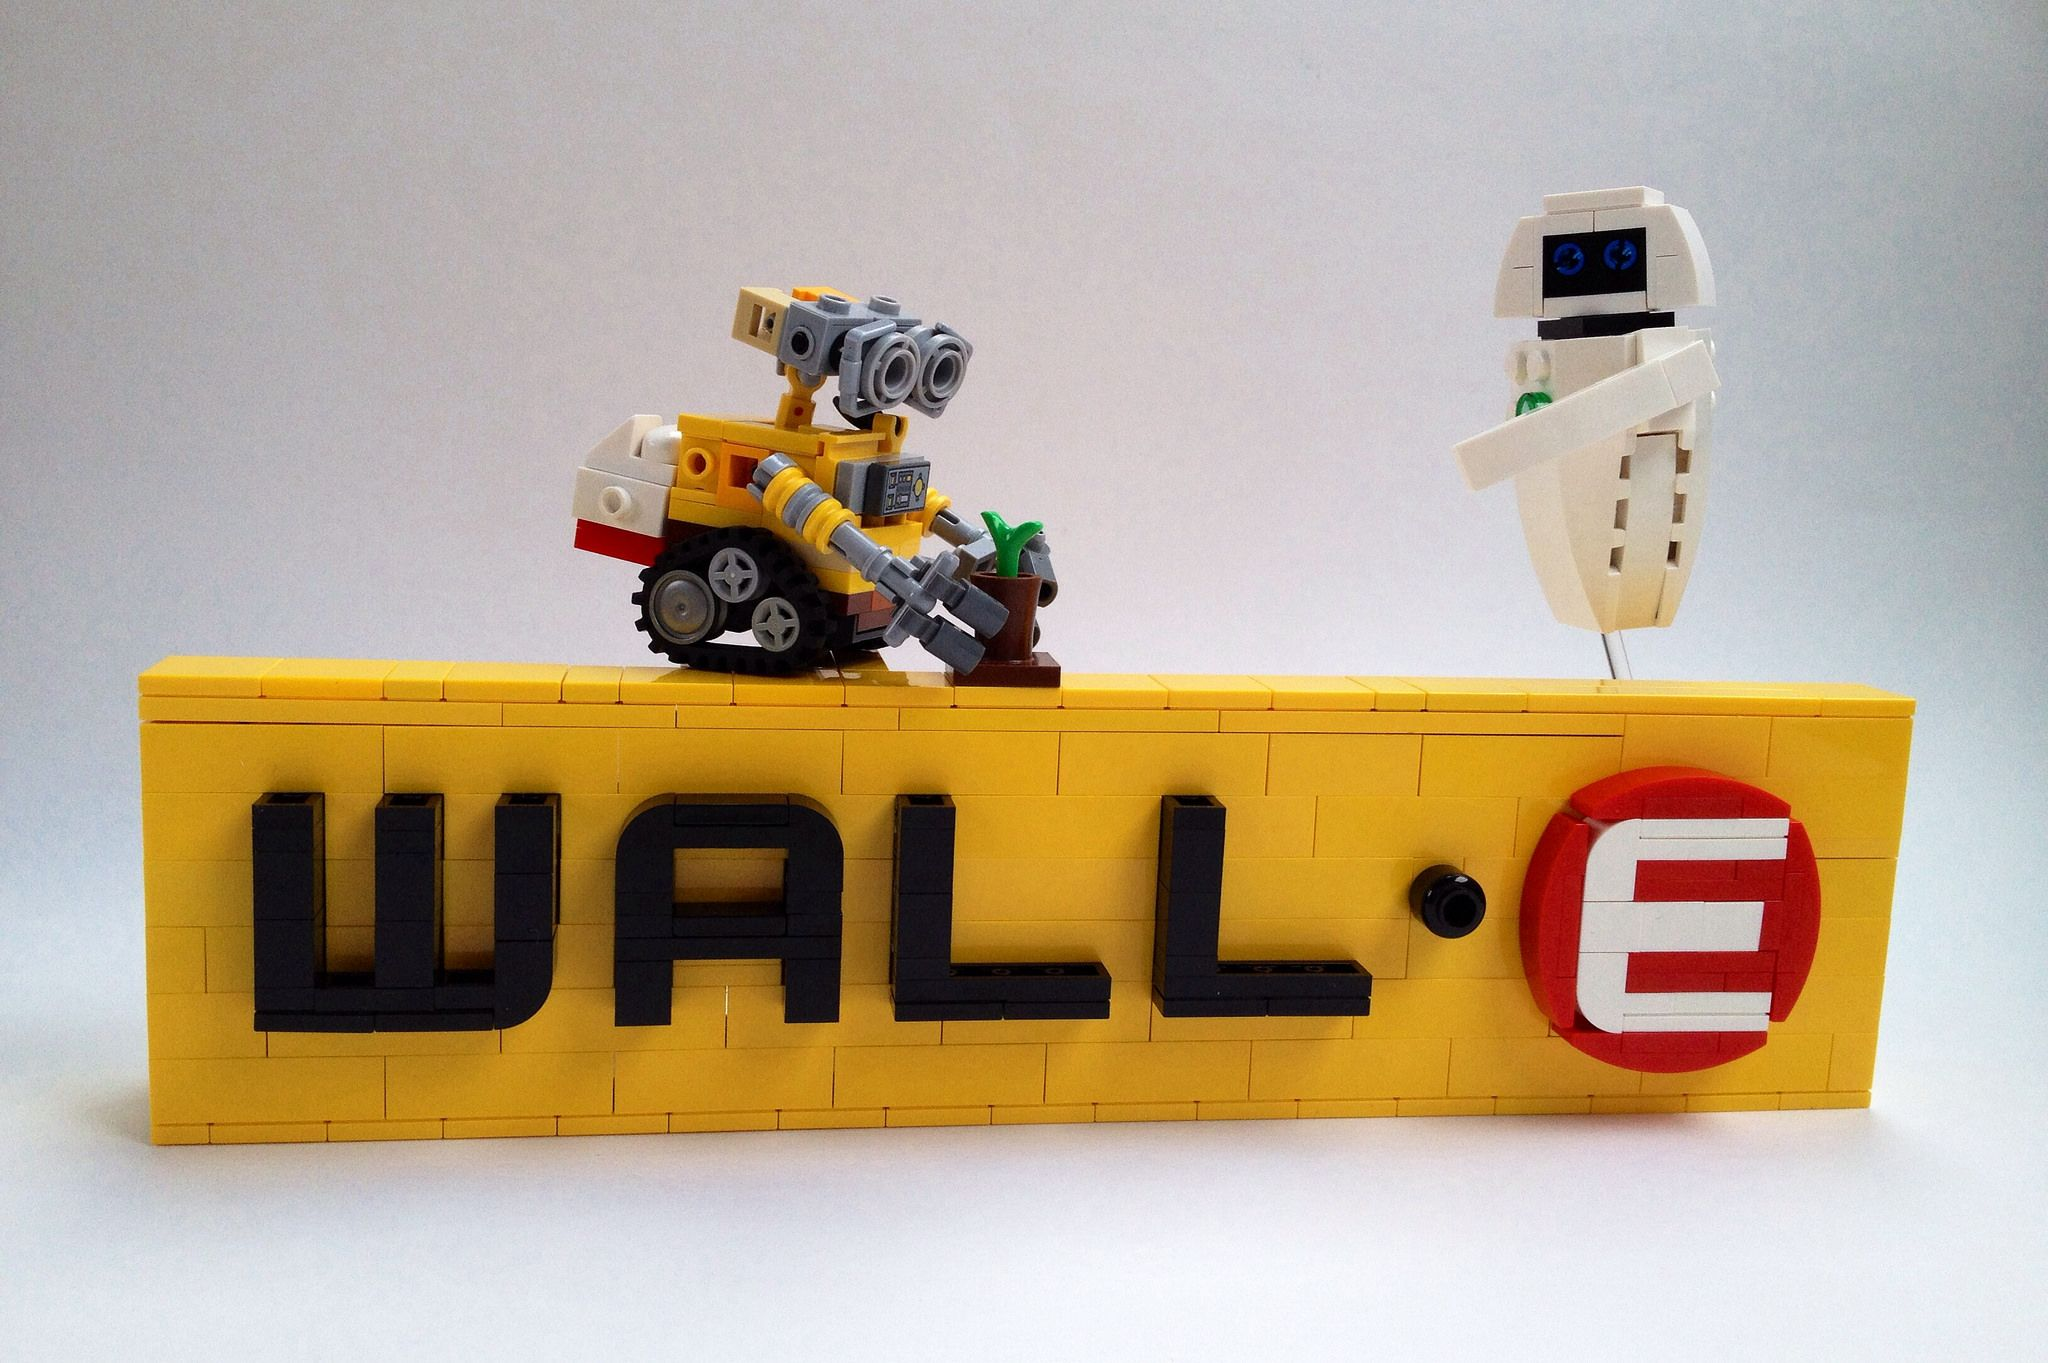 WALL-E Logo   Pinterest   Lego ideas, Lego and Lego creations